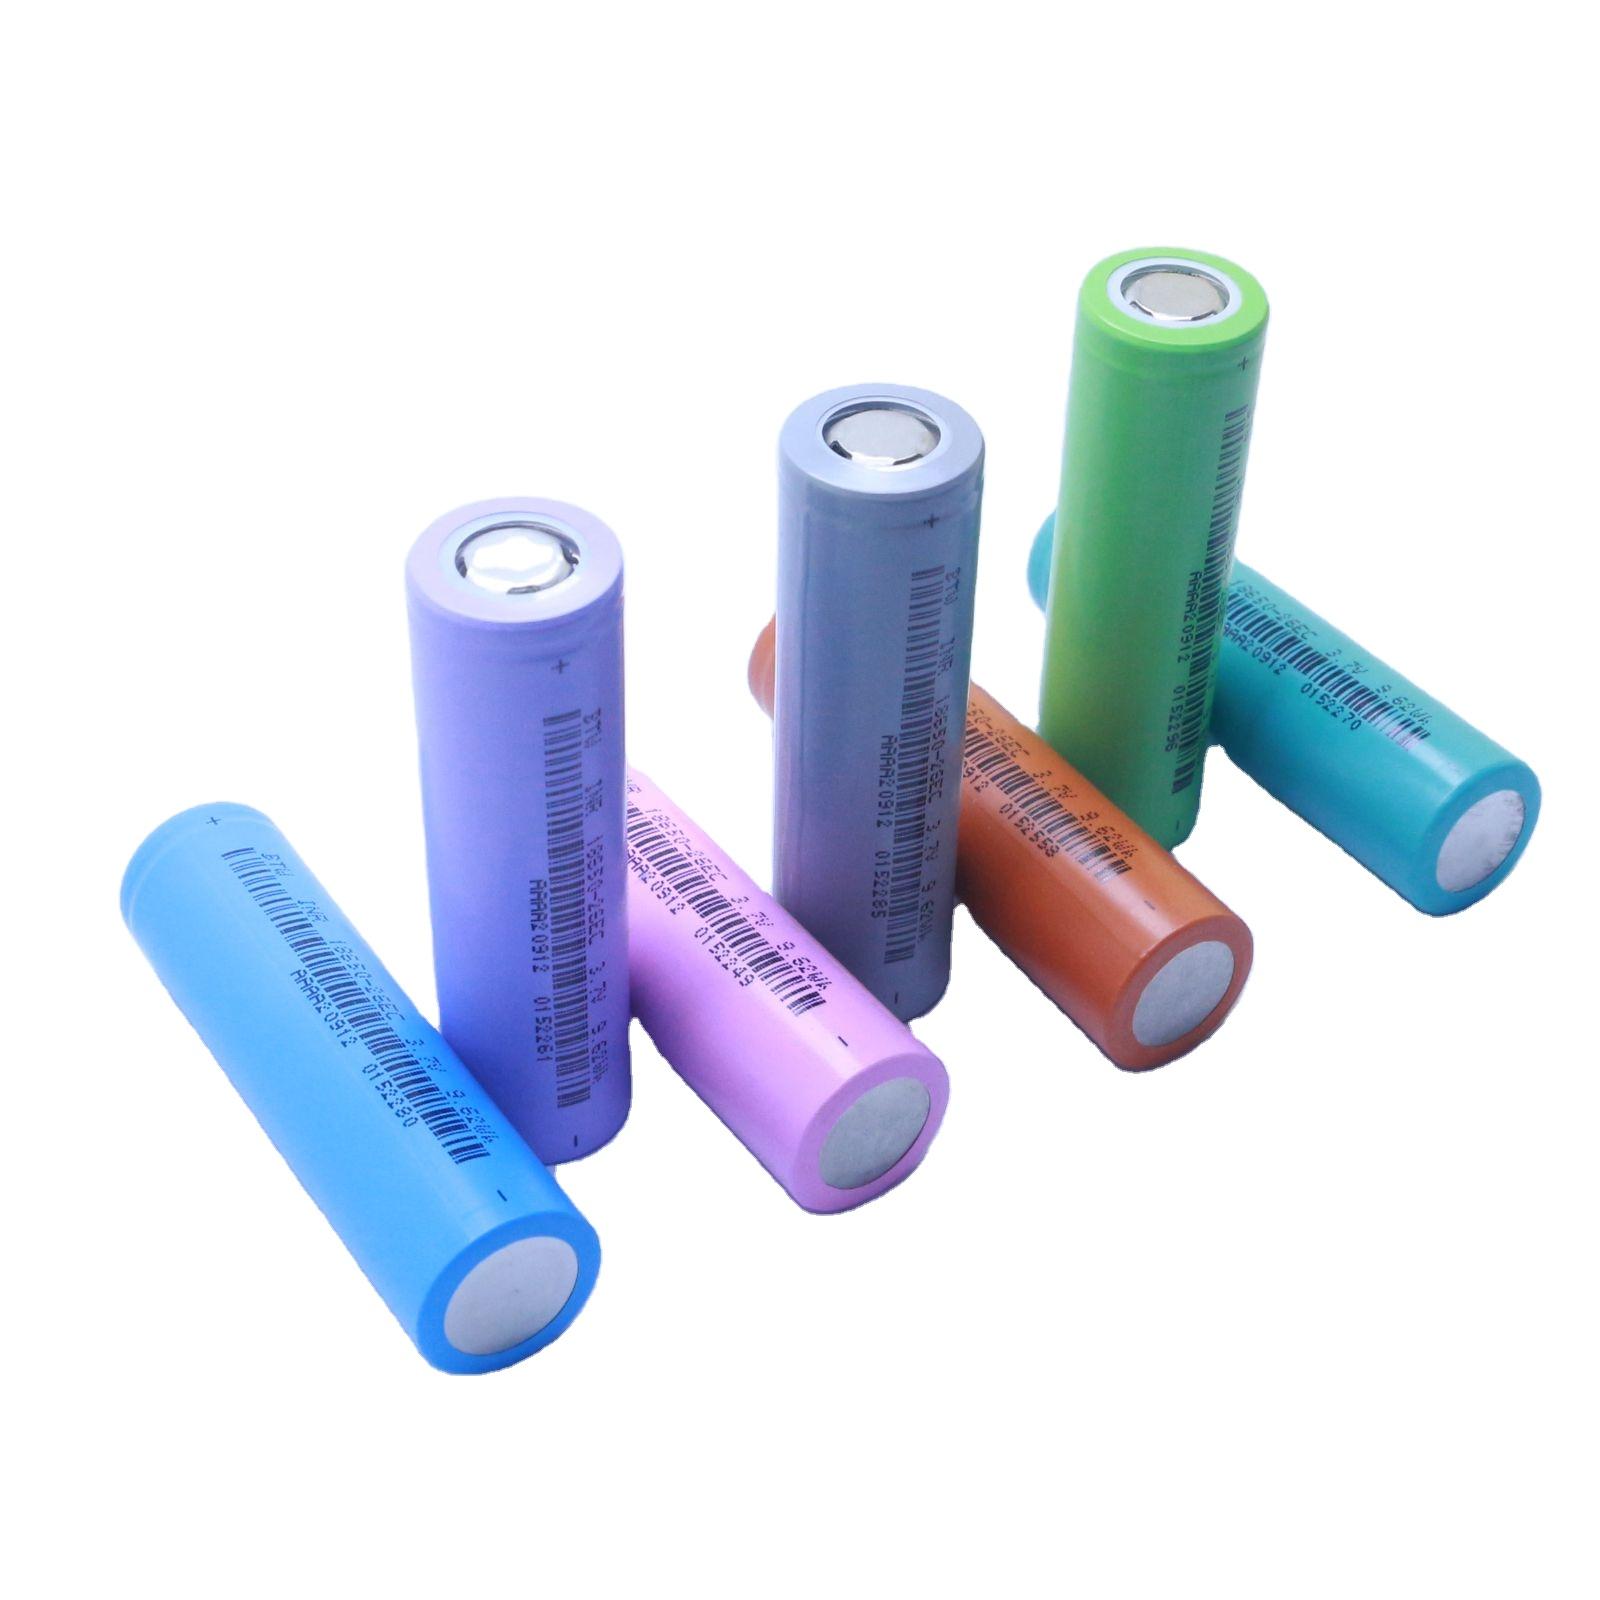 Battery Lithium Ion 3.7v 18650 2600mah Inr18650 Battery - Buy 18650 2600 Battery,18650 Li Ion Battery Rechargeable Battery 3.7v,18650 Lithium Rechargeable Battery 3.7v Product on Alibaba.com